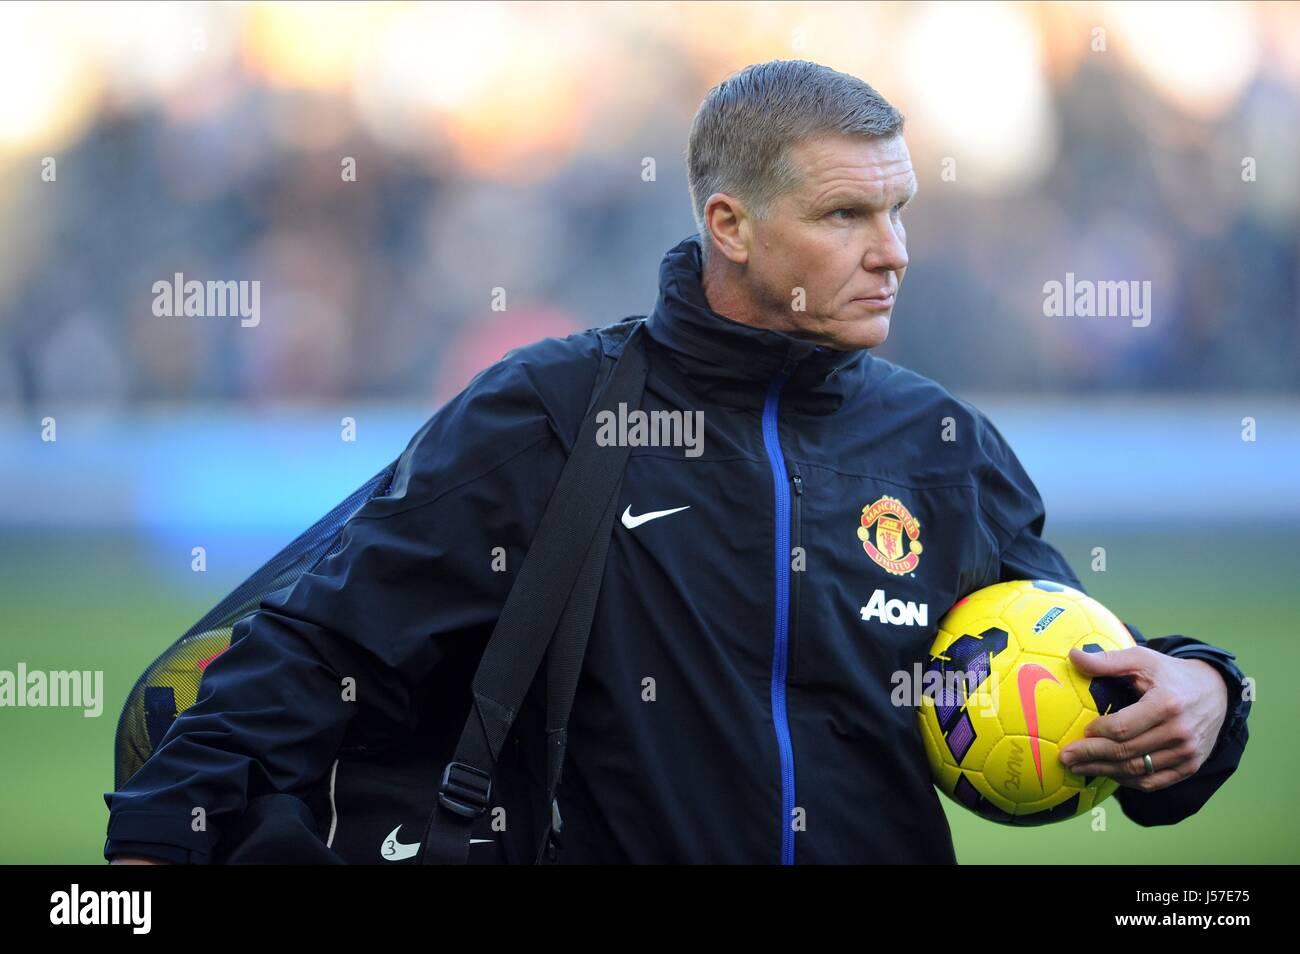 chris woods manchester united fc goalkeeping coach manchester united fc kc stadium hull england 26 december